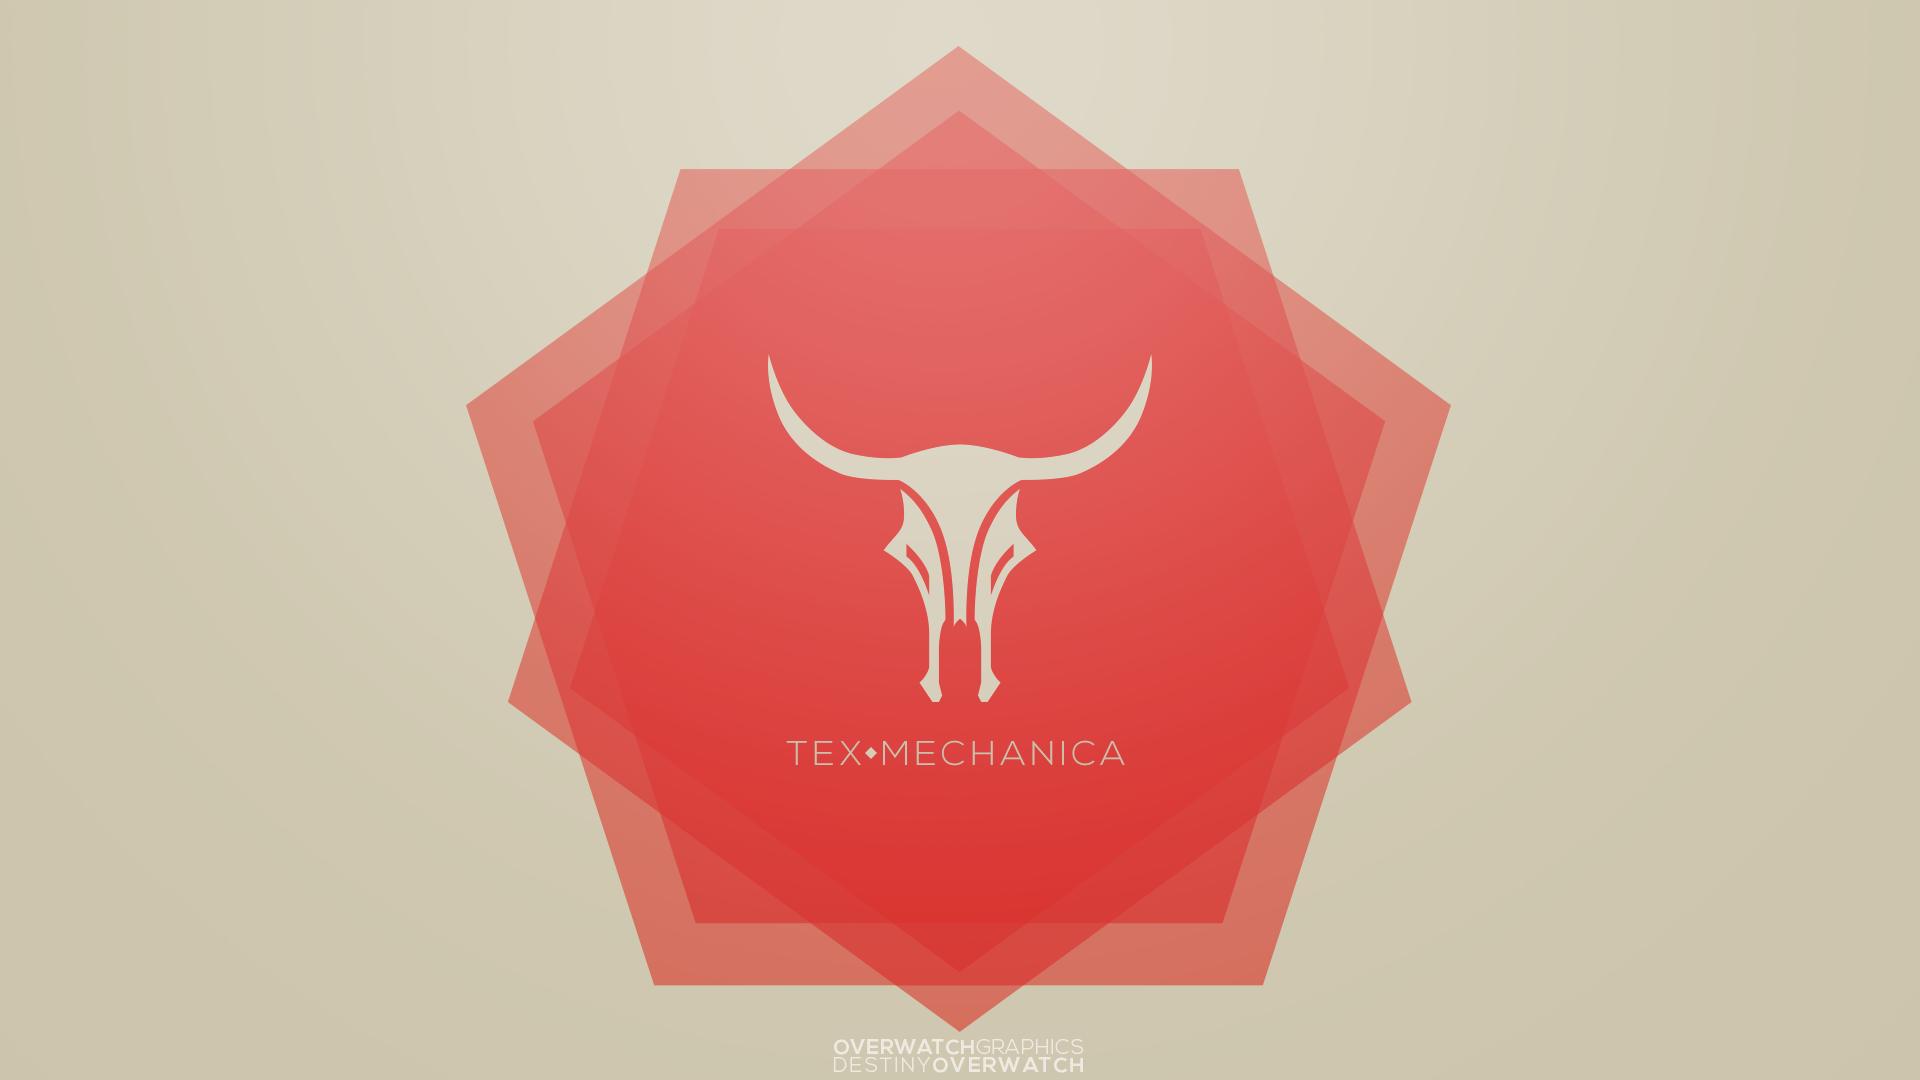 Destiny - Tex Mechanica Wallpaper (Flat/Clean) by OverwatchGraphics